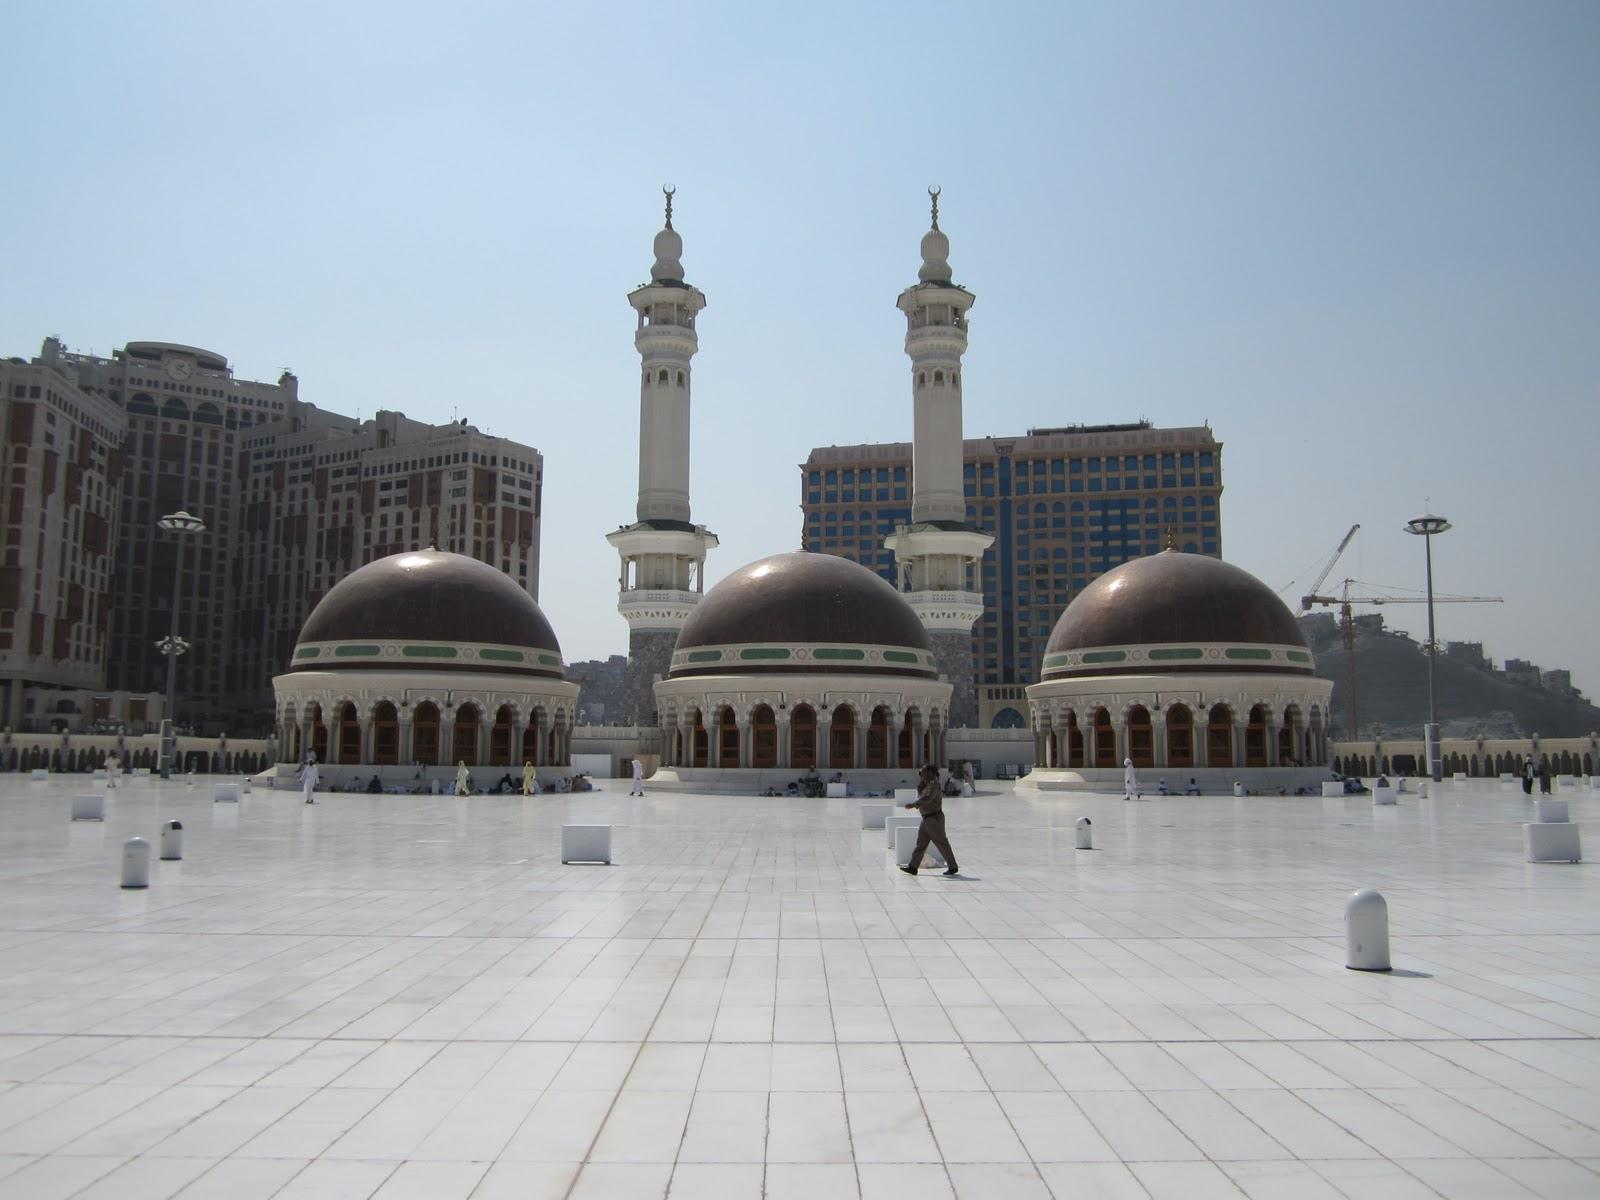 masjid al haram Hotels near masjid al haram, mecca on tripadvisor: find 13877 traveller reviews , 3883 candid photos, and prices for 30 hotels near masjid al haram in mecca, saudi arabia.